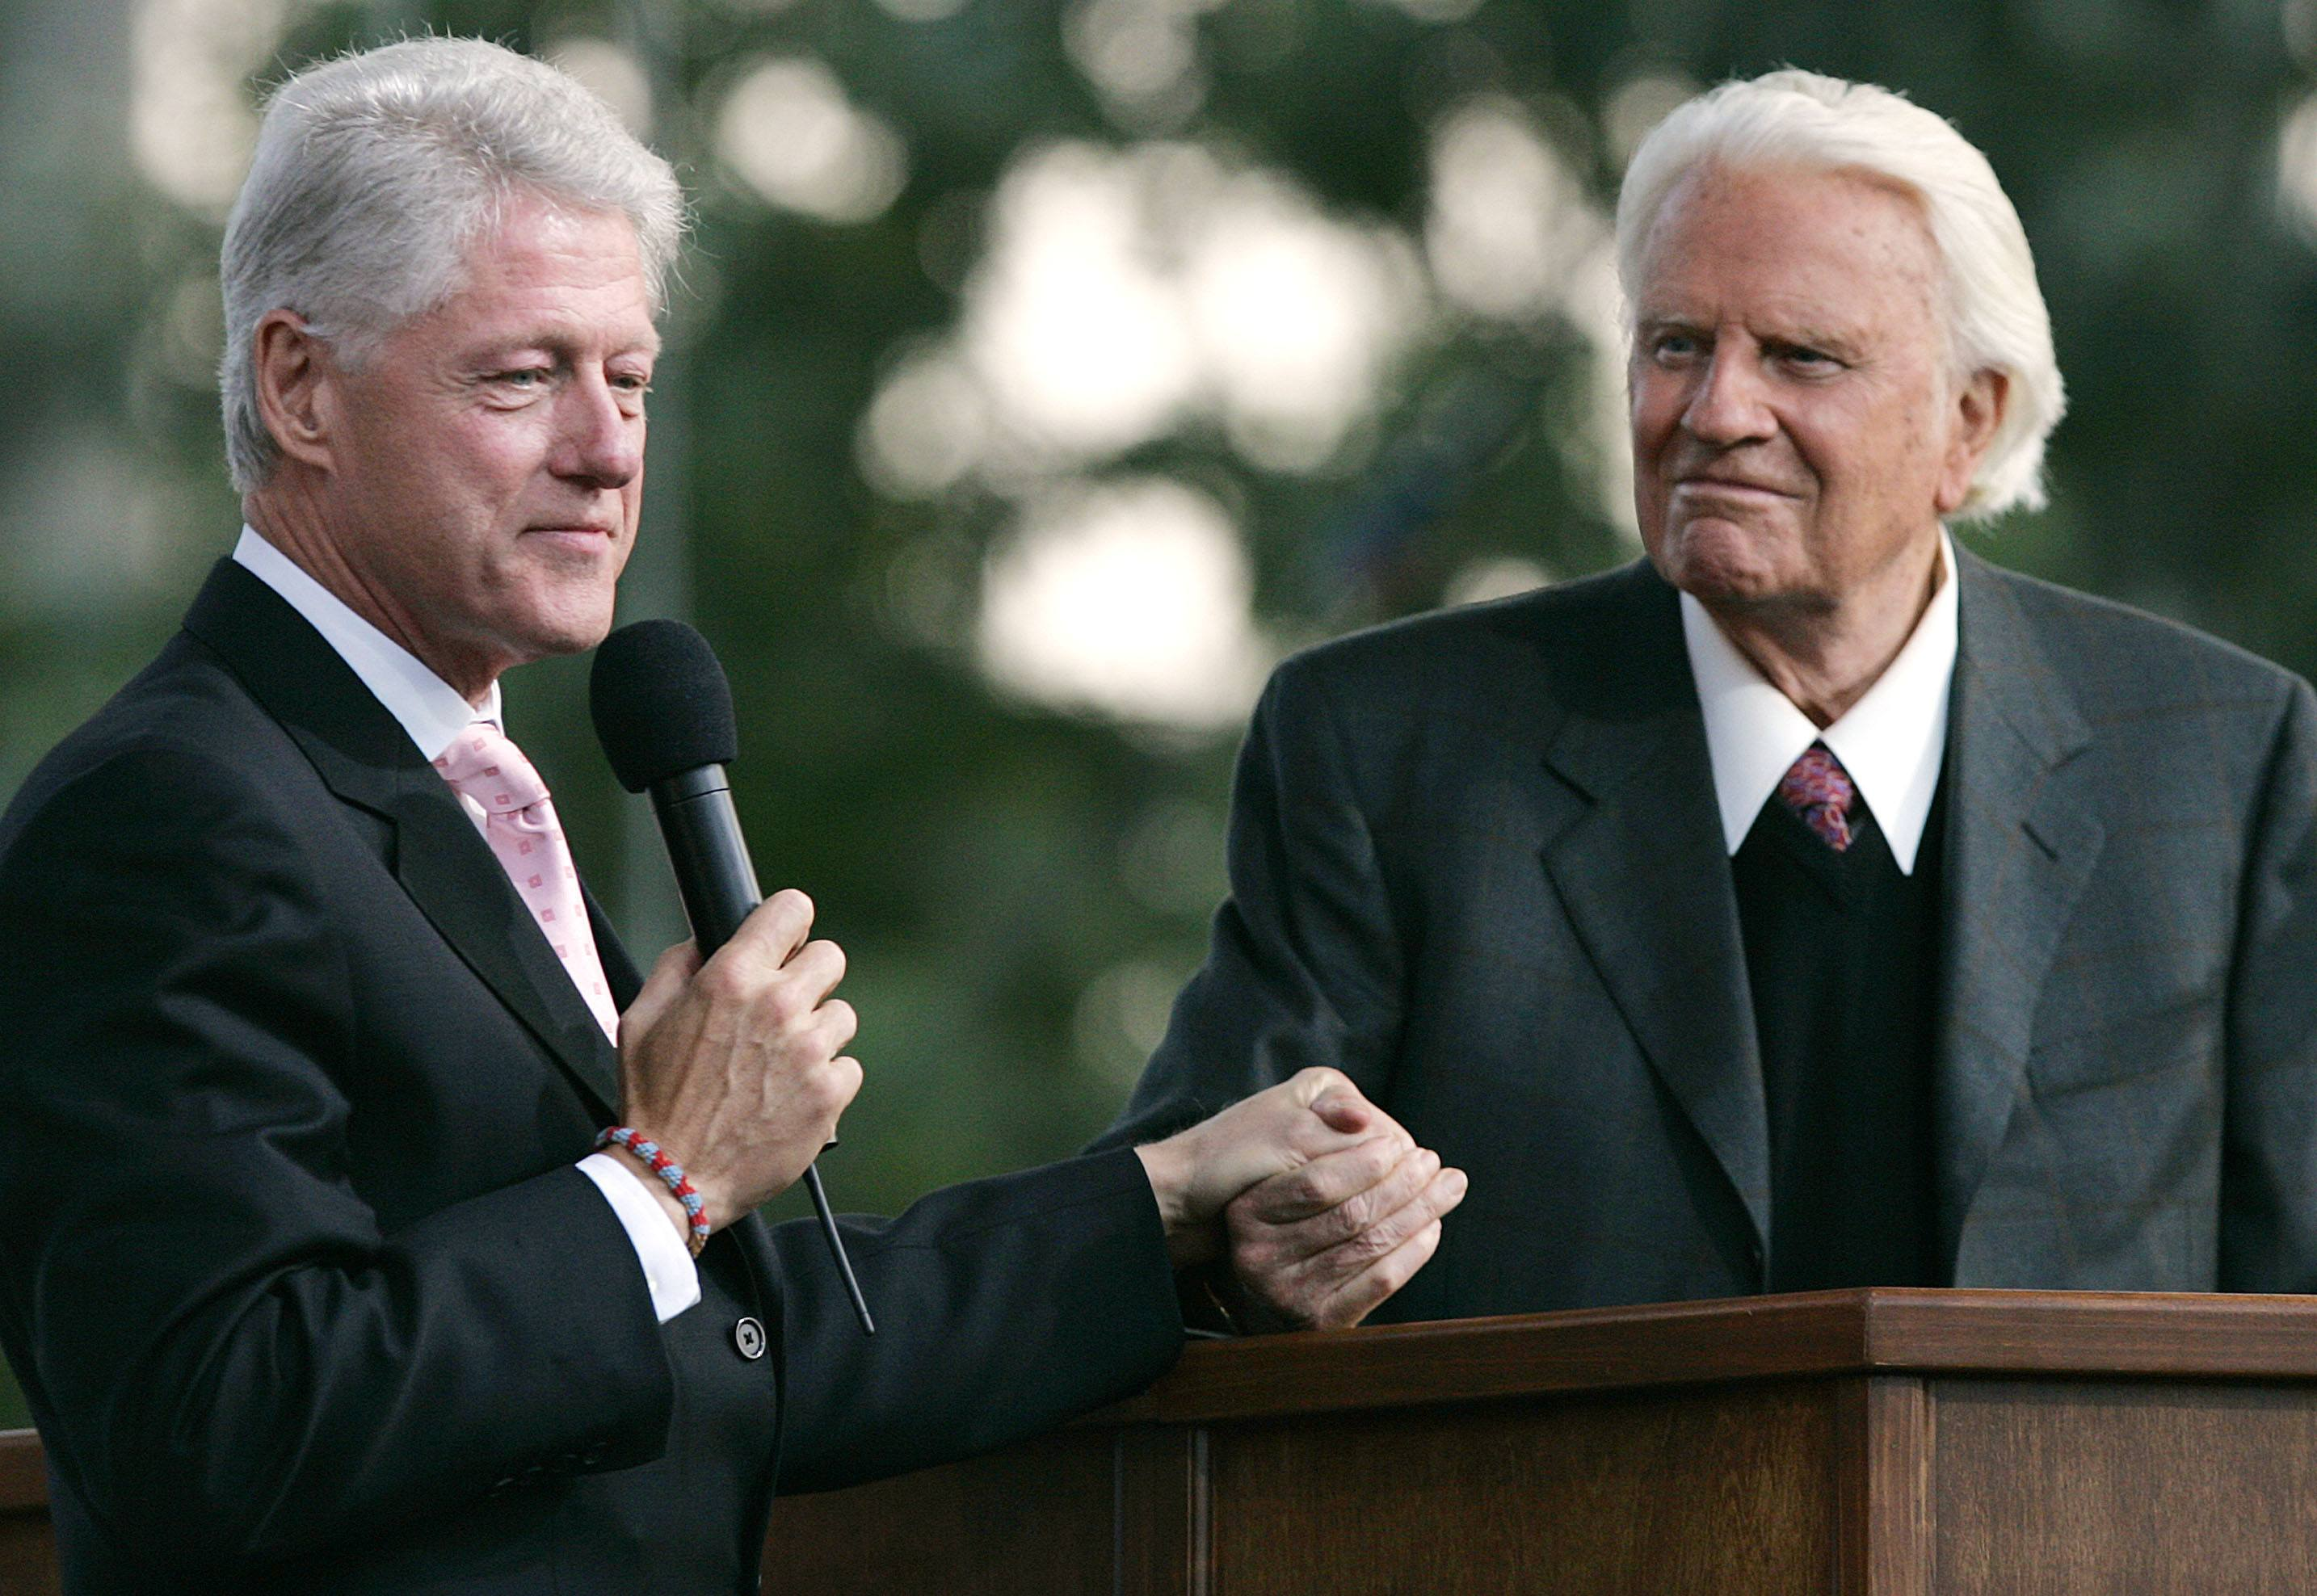 Billy Graham and Bill Clinton